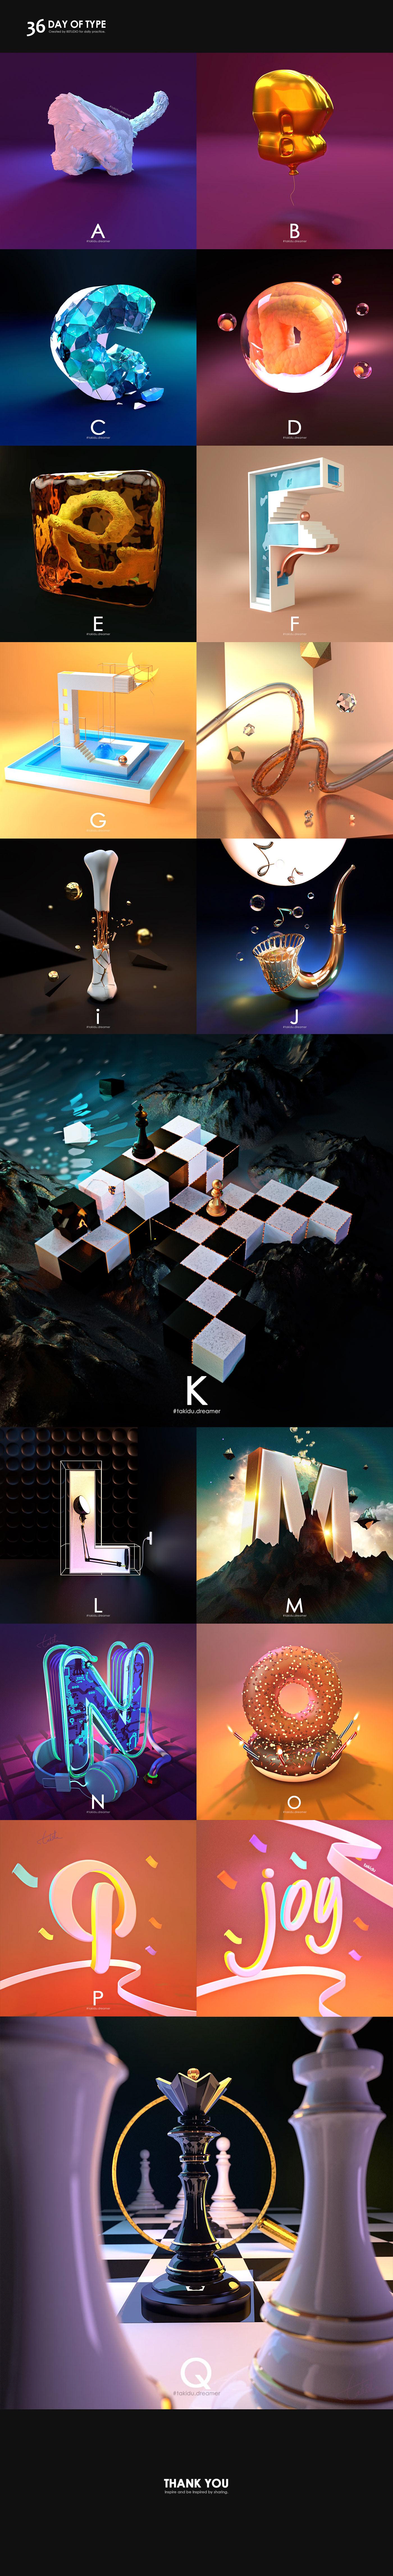 36dayoftype 3D ABC alphabet blender concept text type typo typography